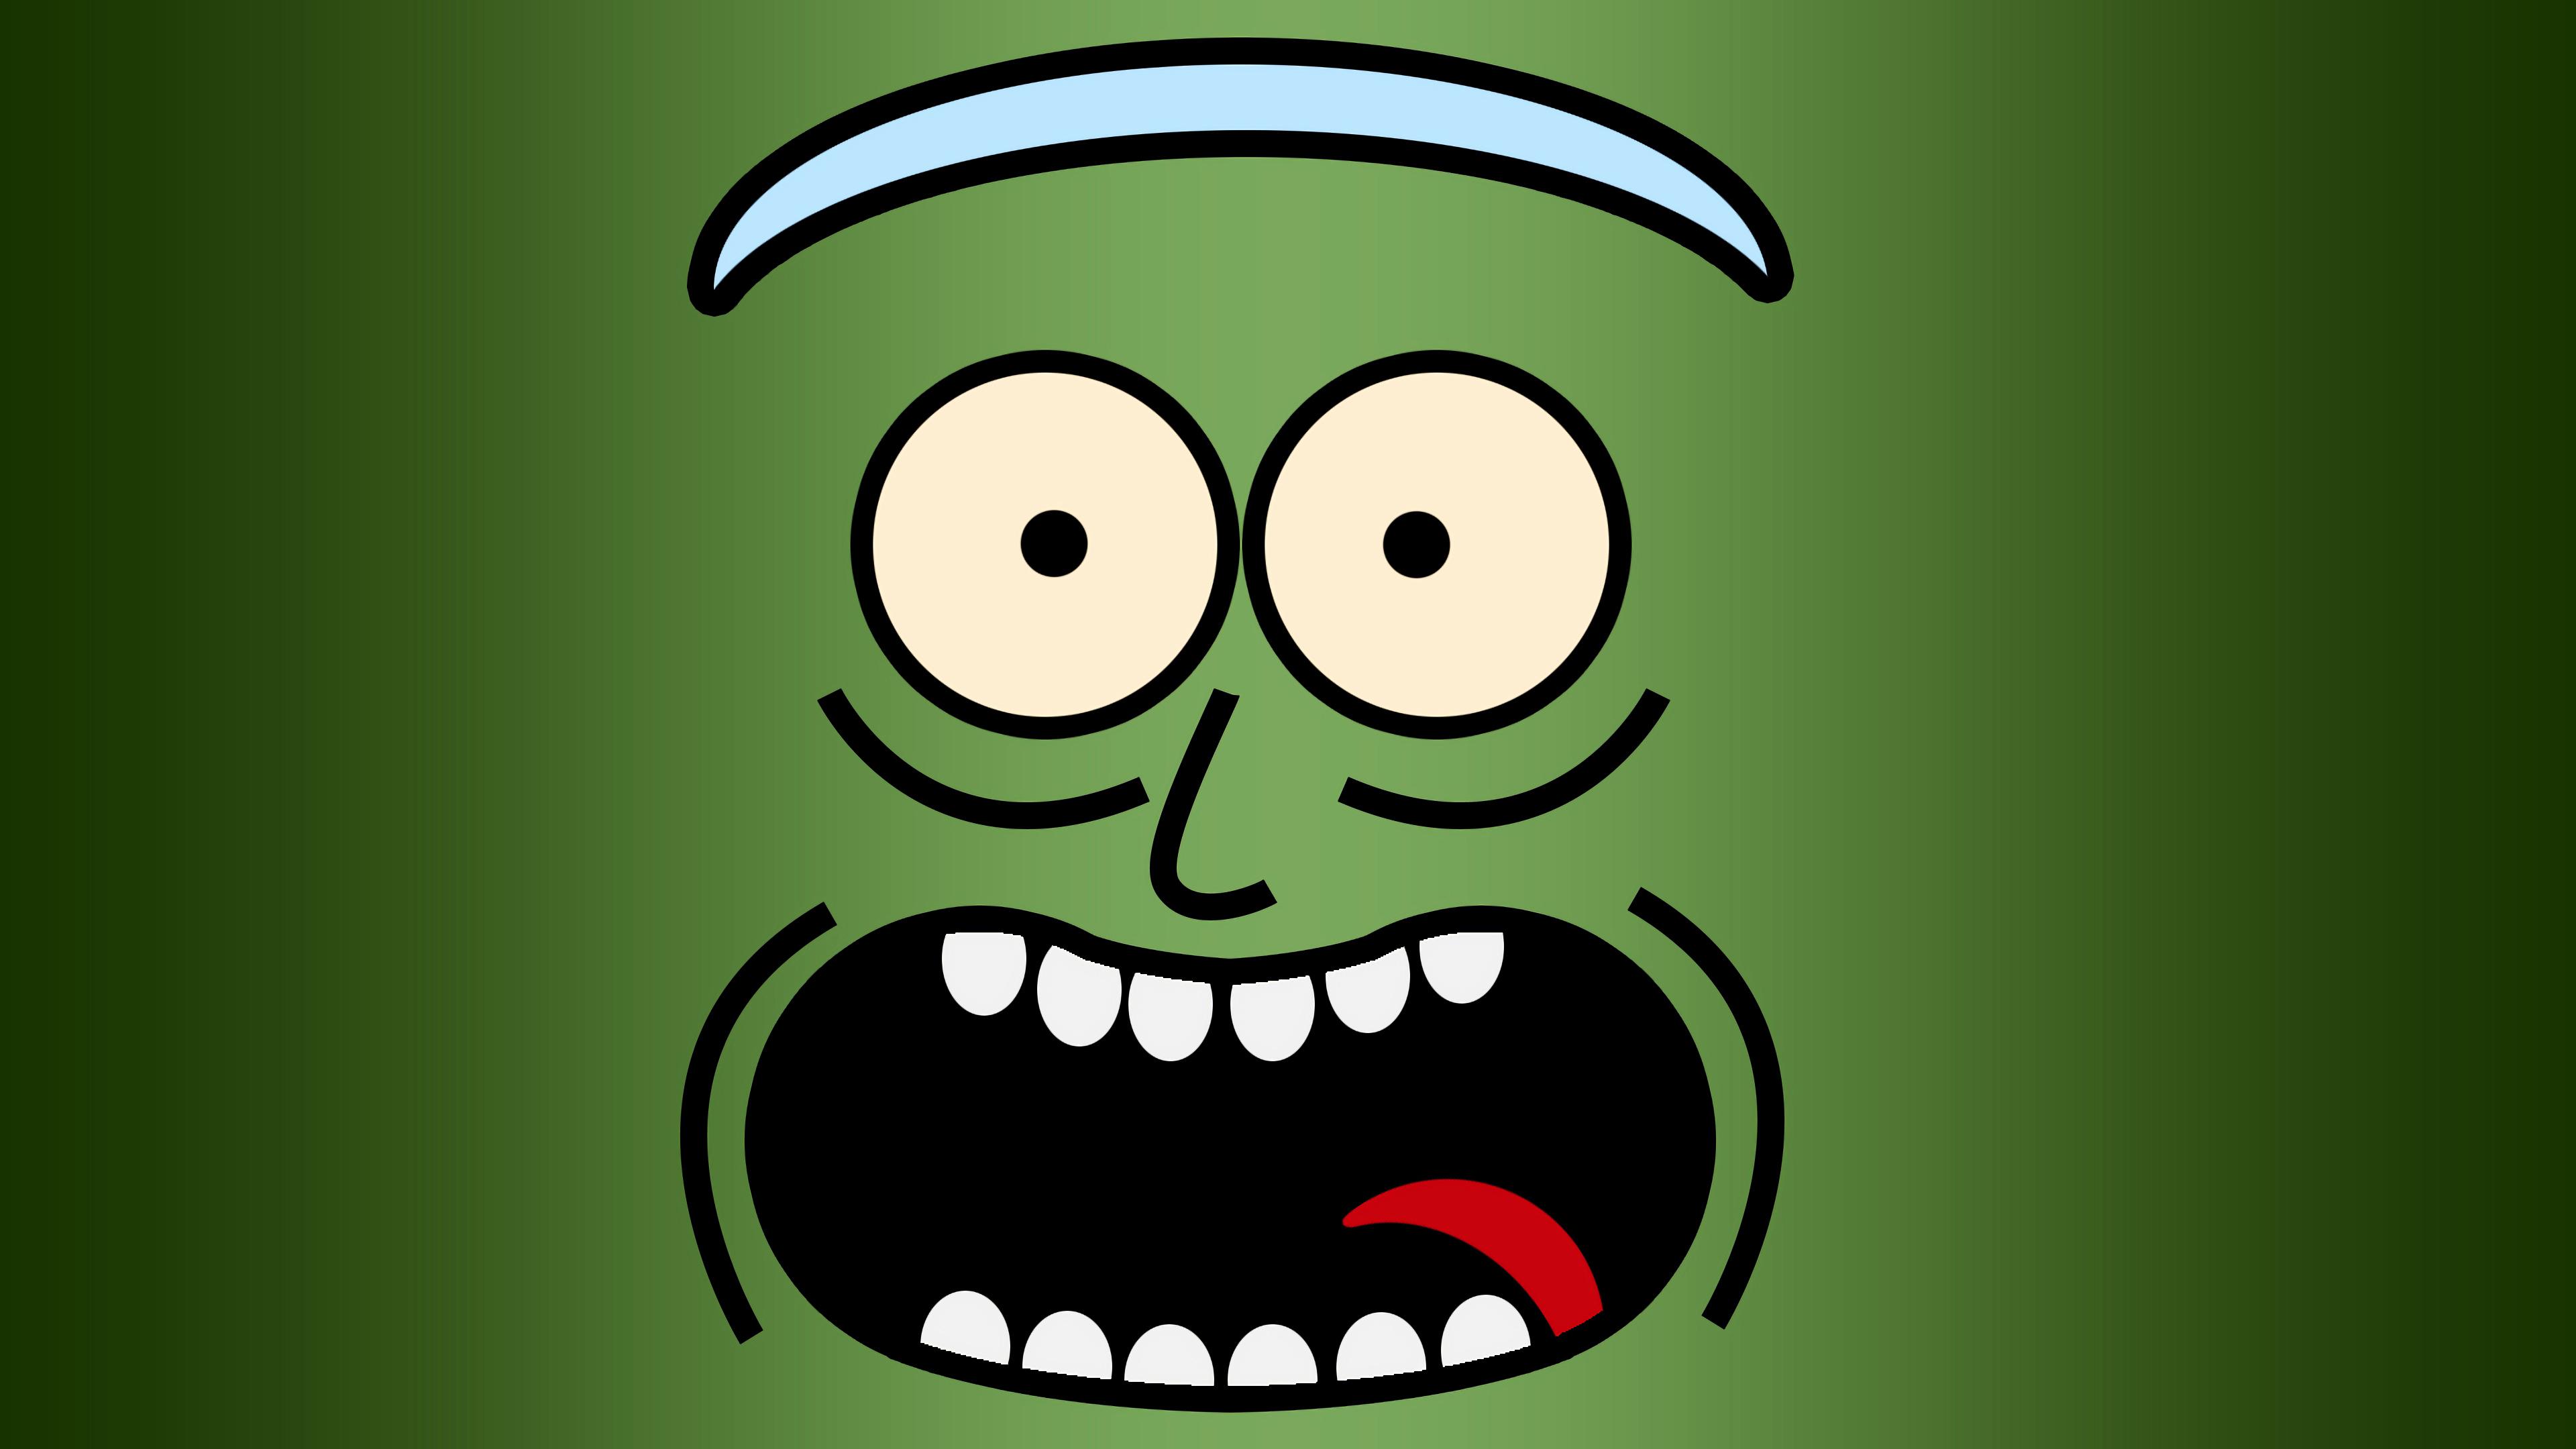 pickle rick 1578251697 - Pickle Rick - Pickle Rick 4k wallpaper